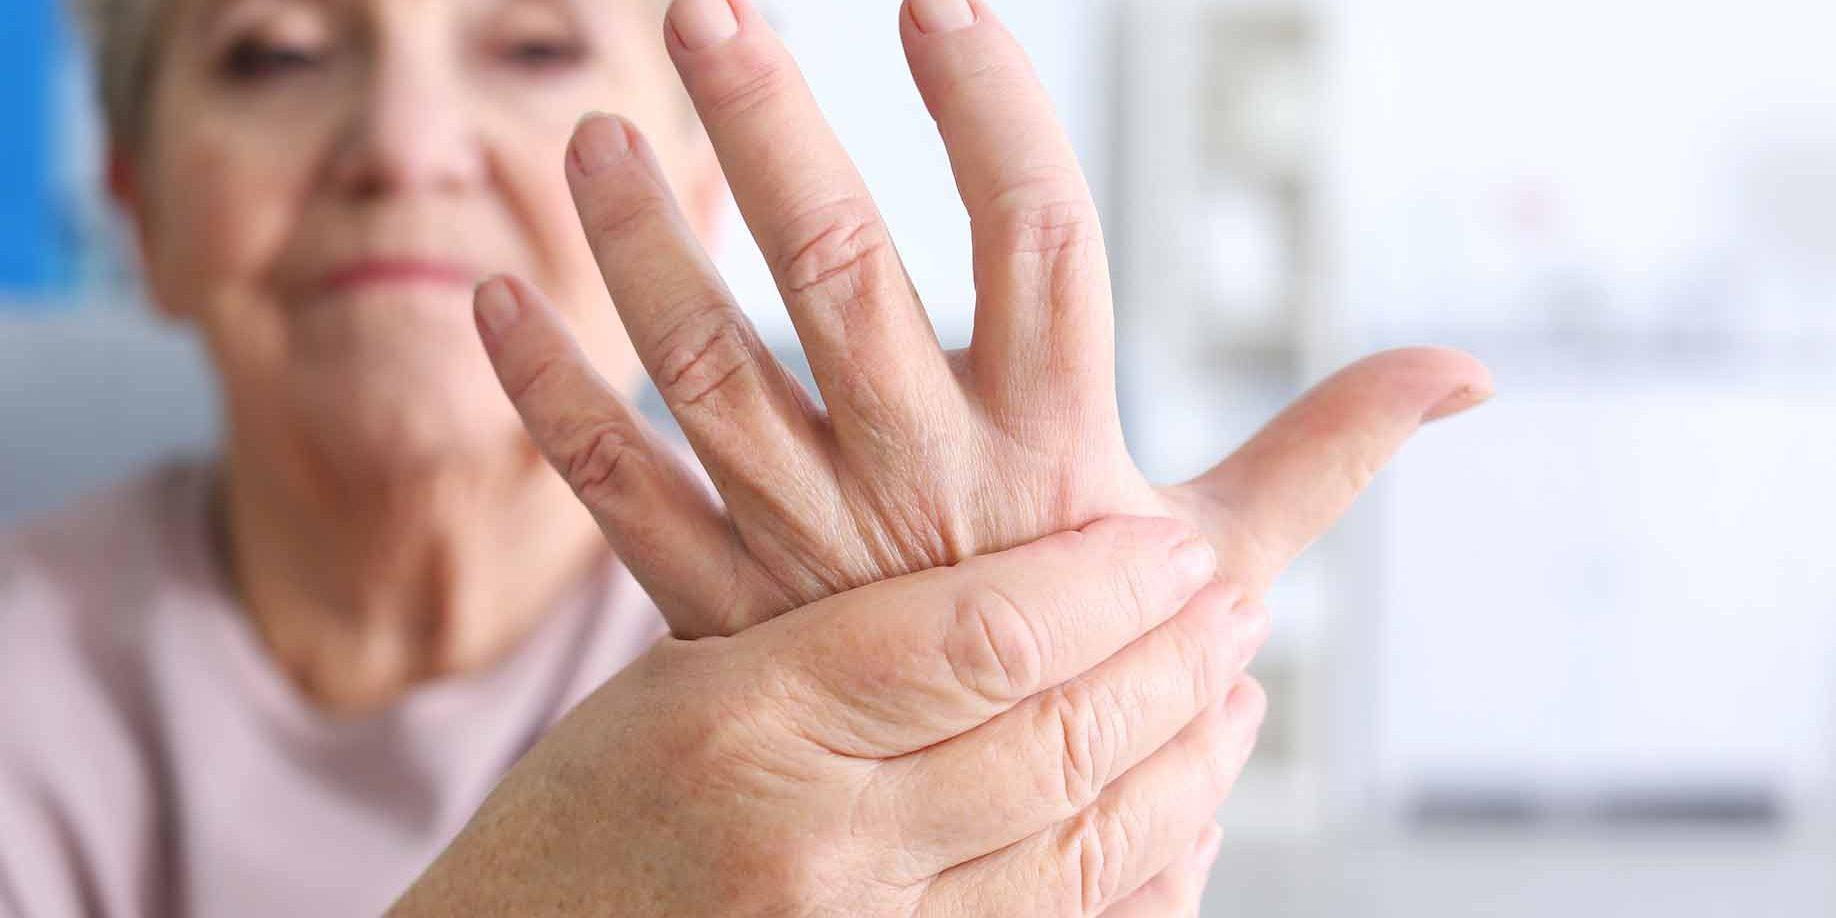 gydymas sąnarių oda